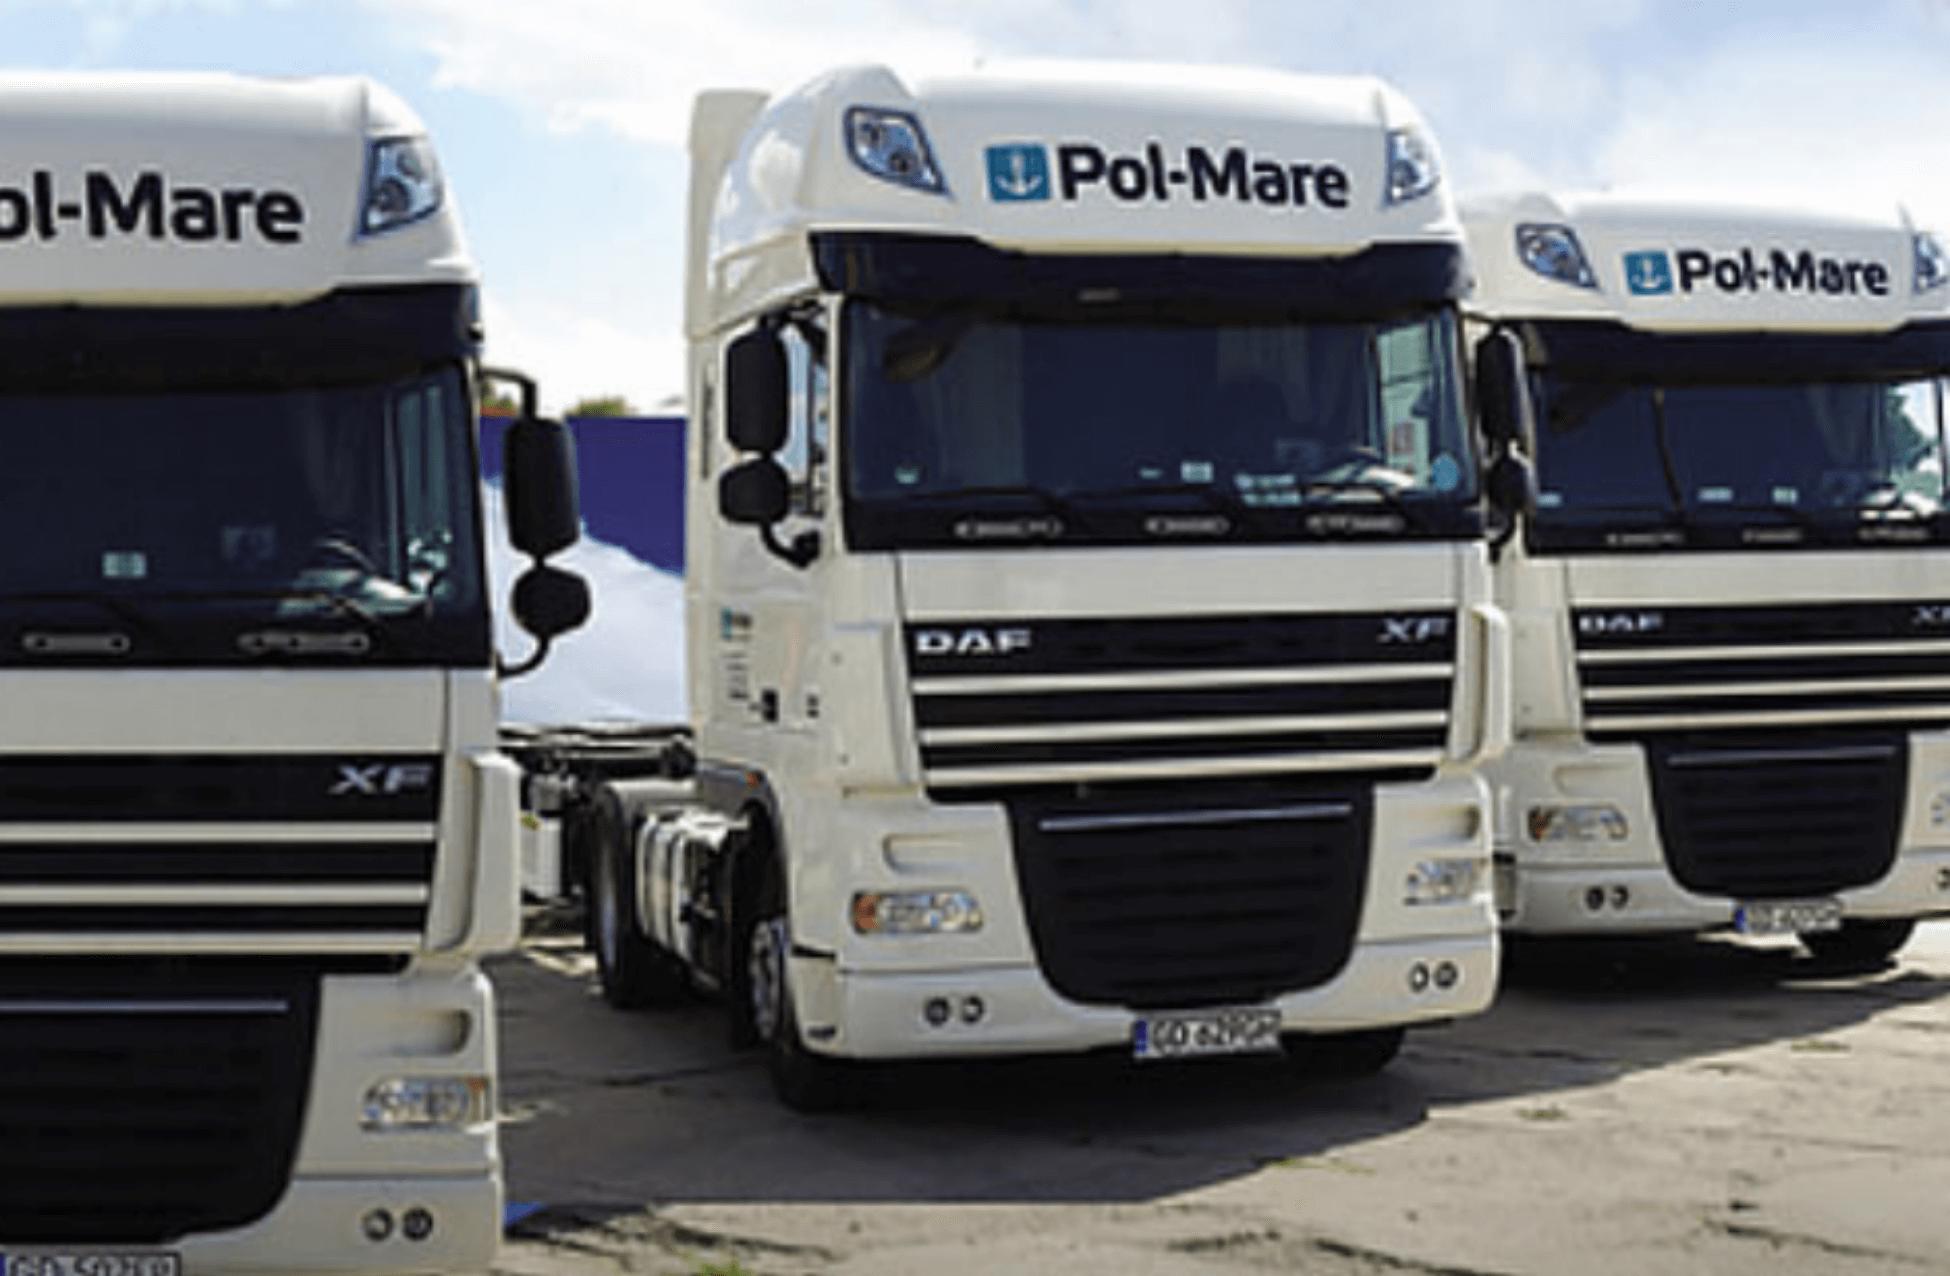 BHP Firma Transportowa